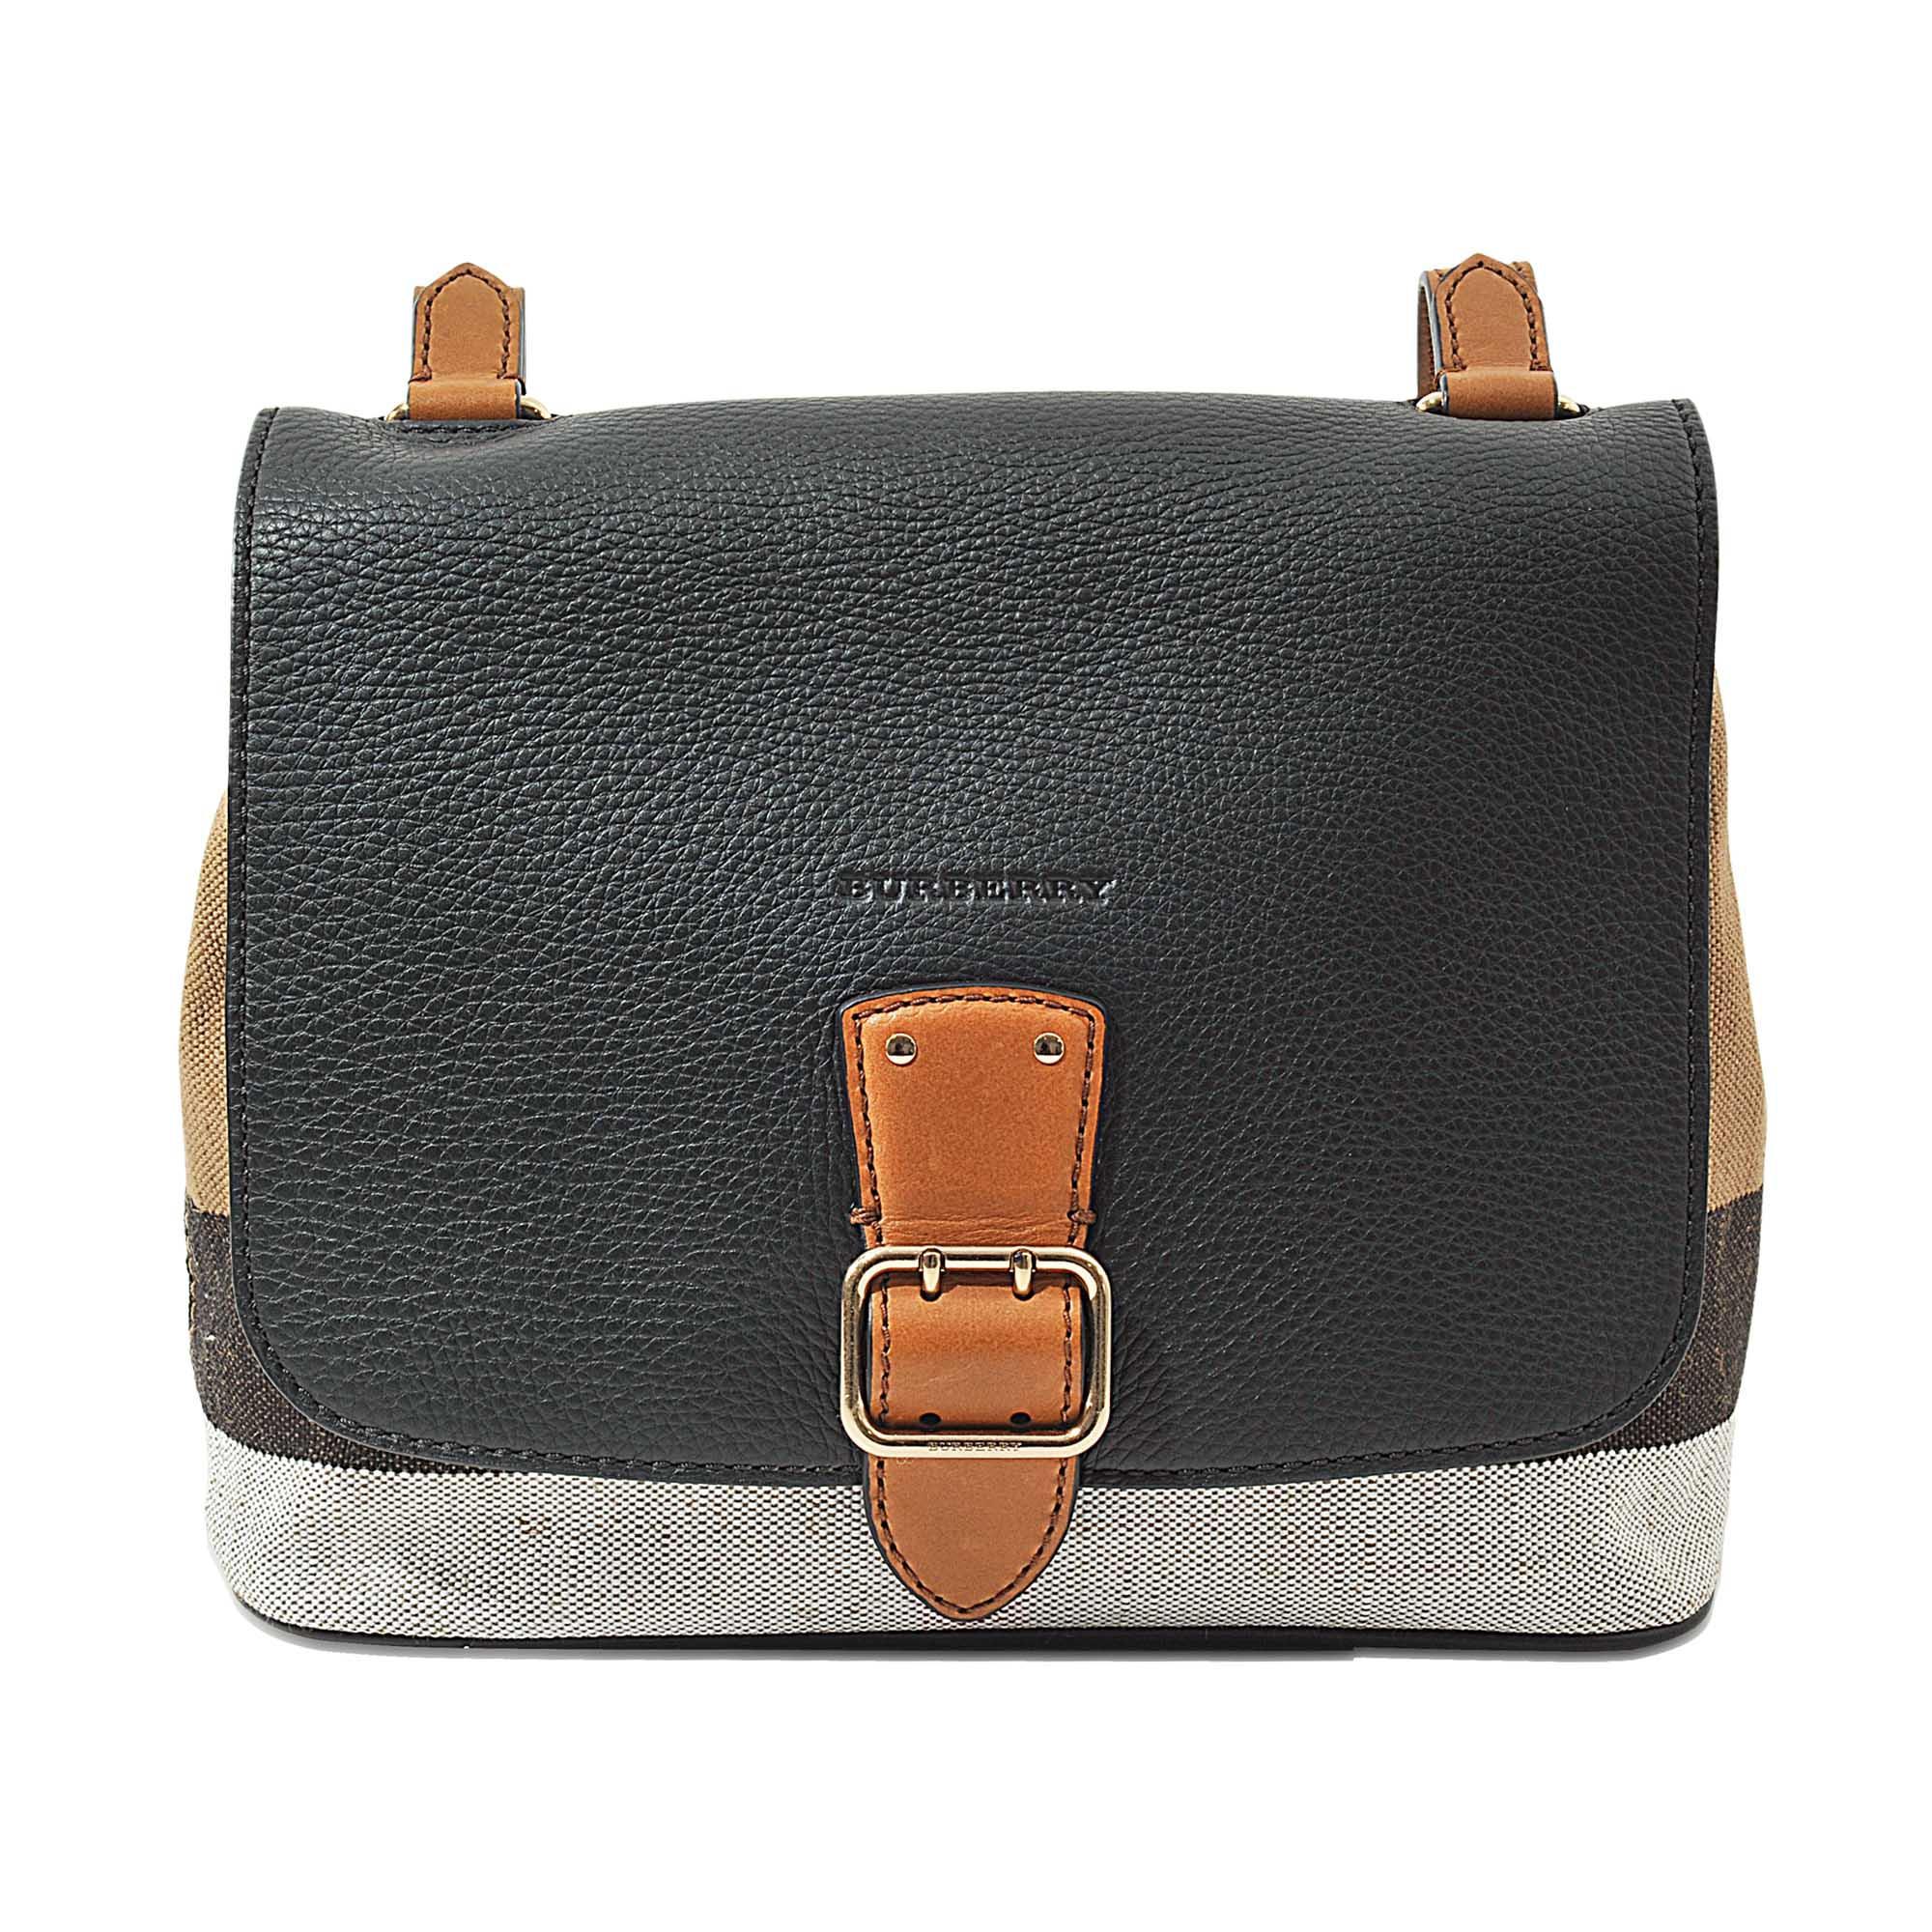 d3c4896f20a8 Burberry Small Shellwood Bag - Lyst